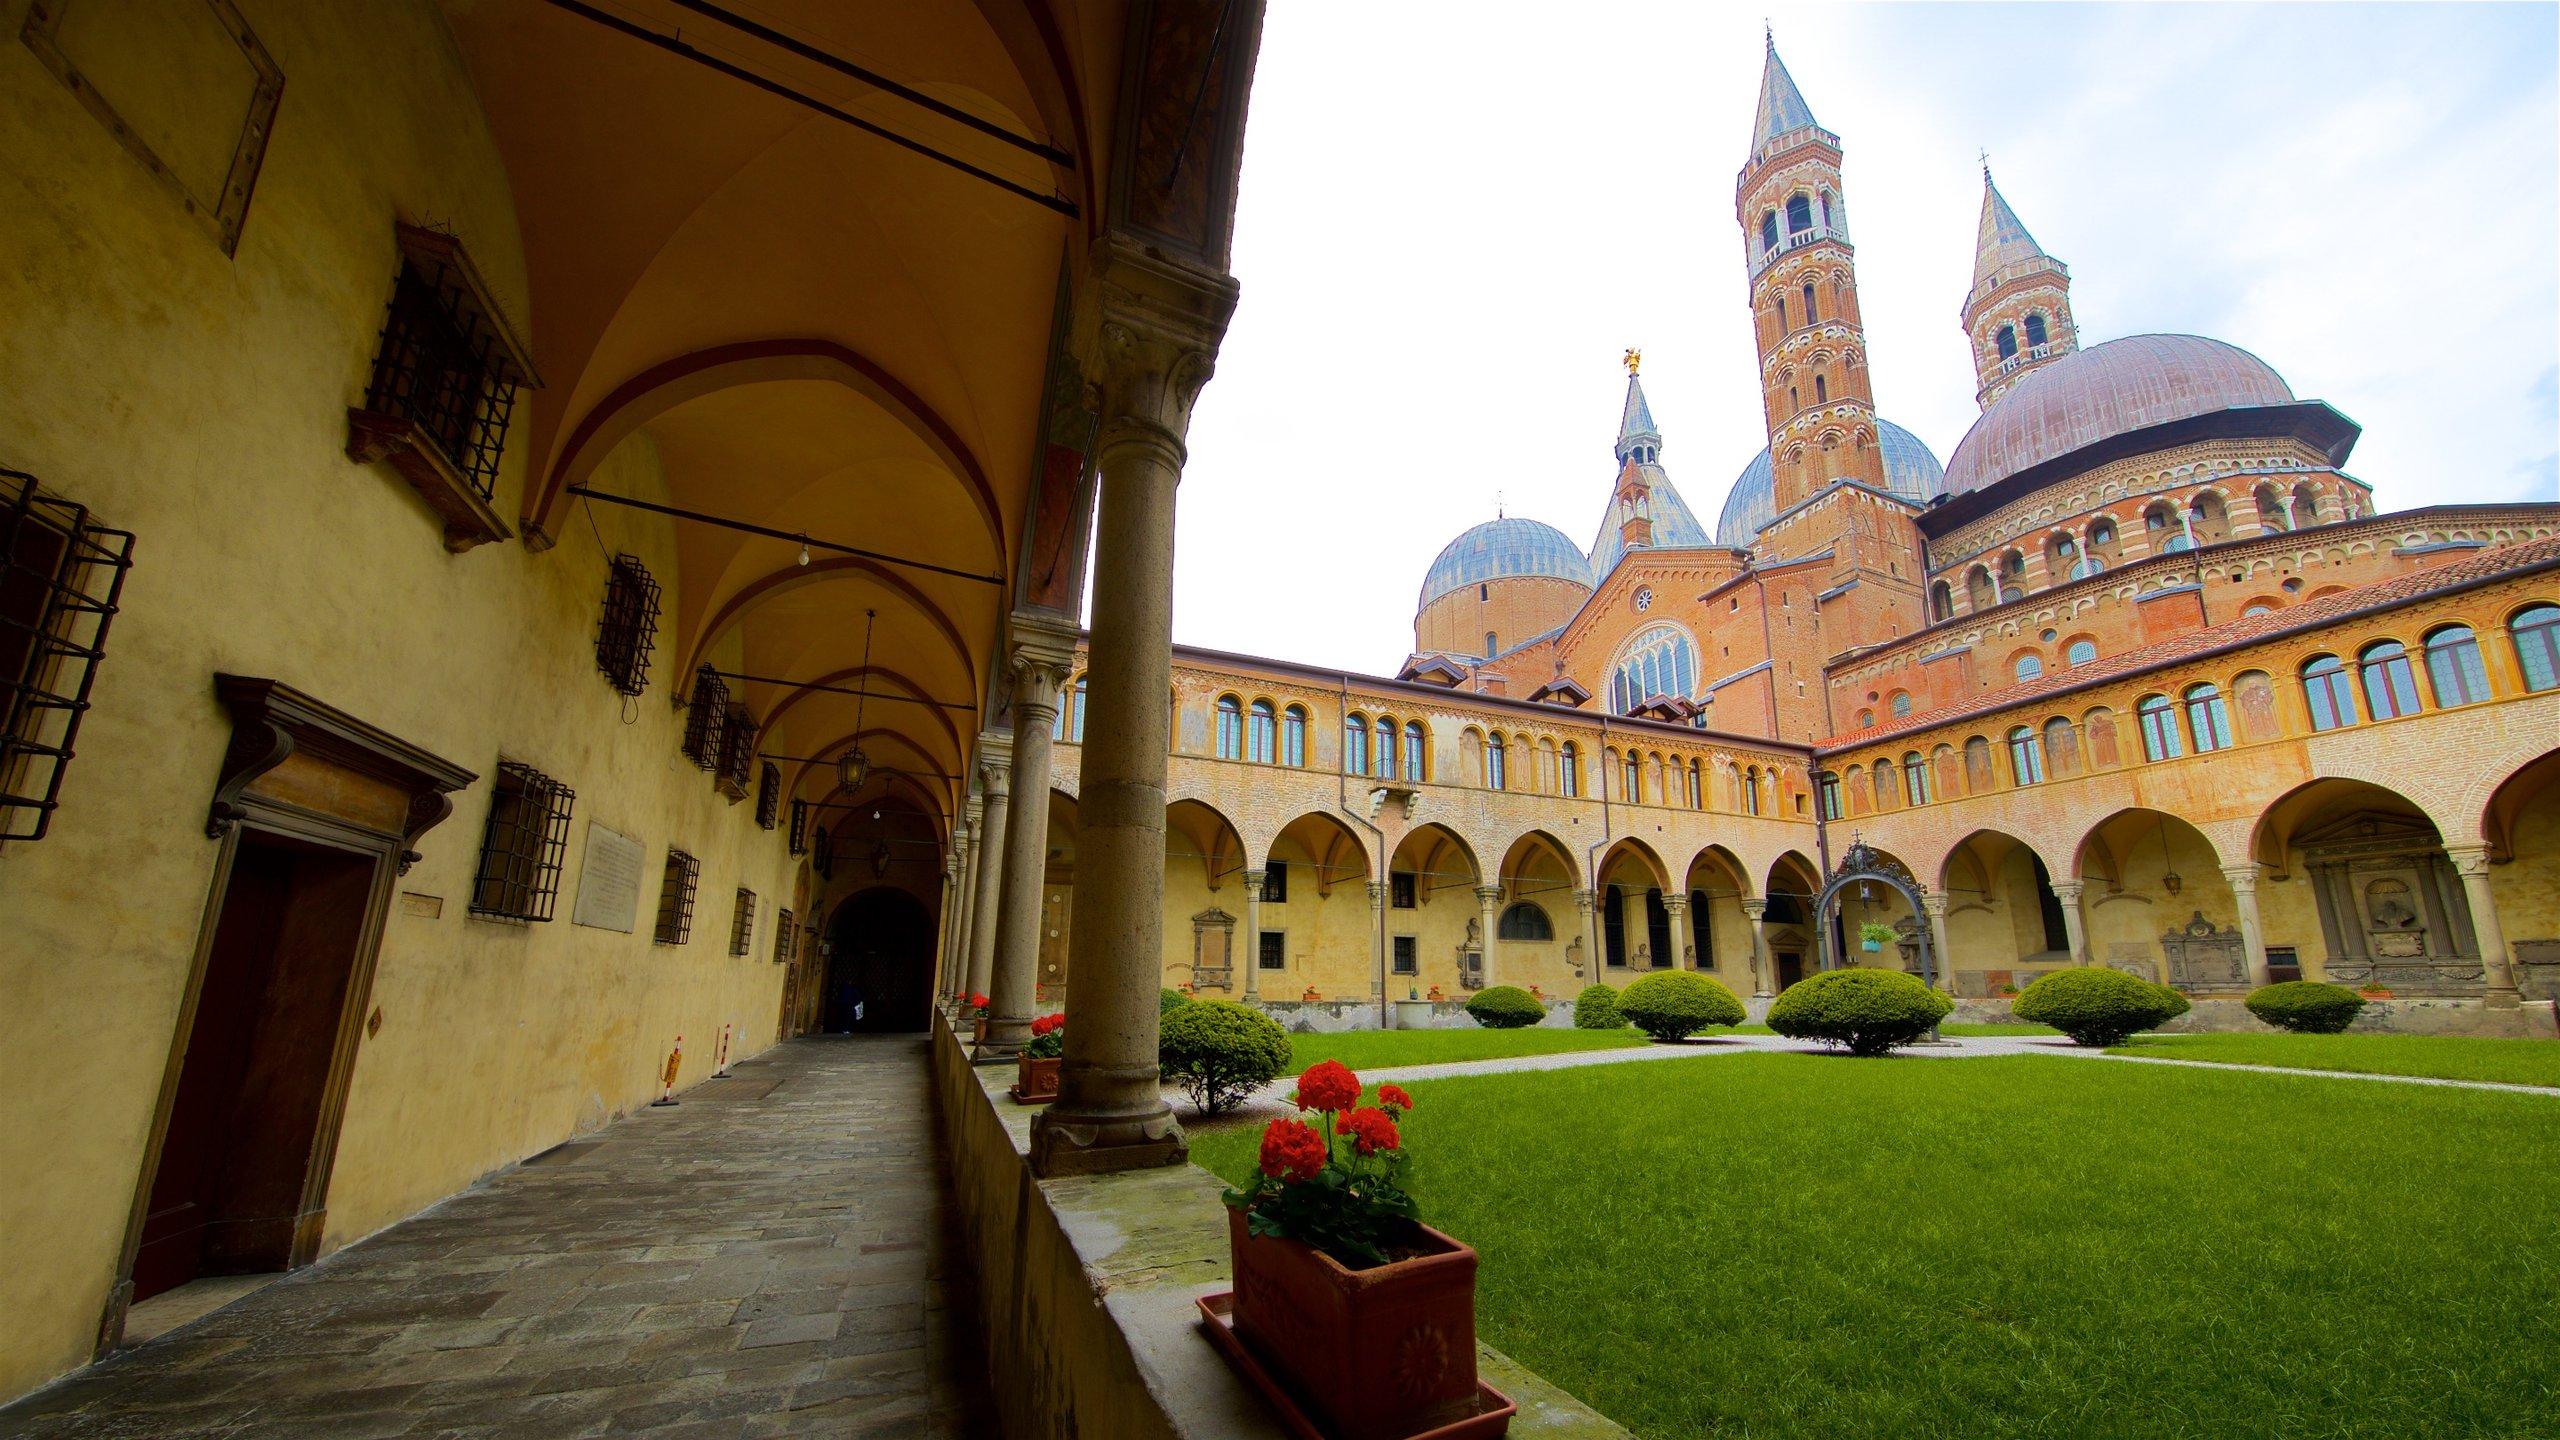 Stadtzentrum von Padua, Padua, Veneto, Italien